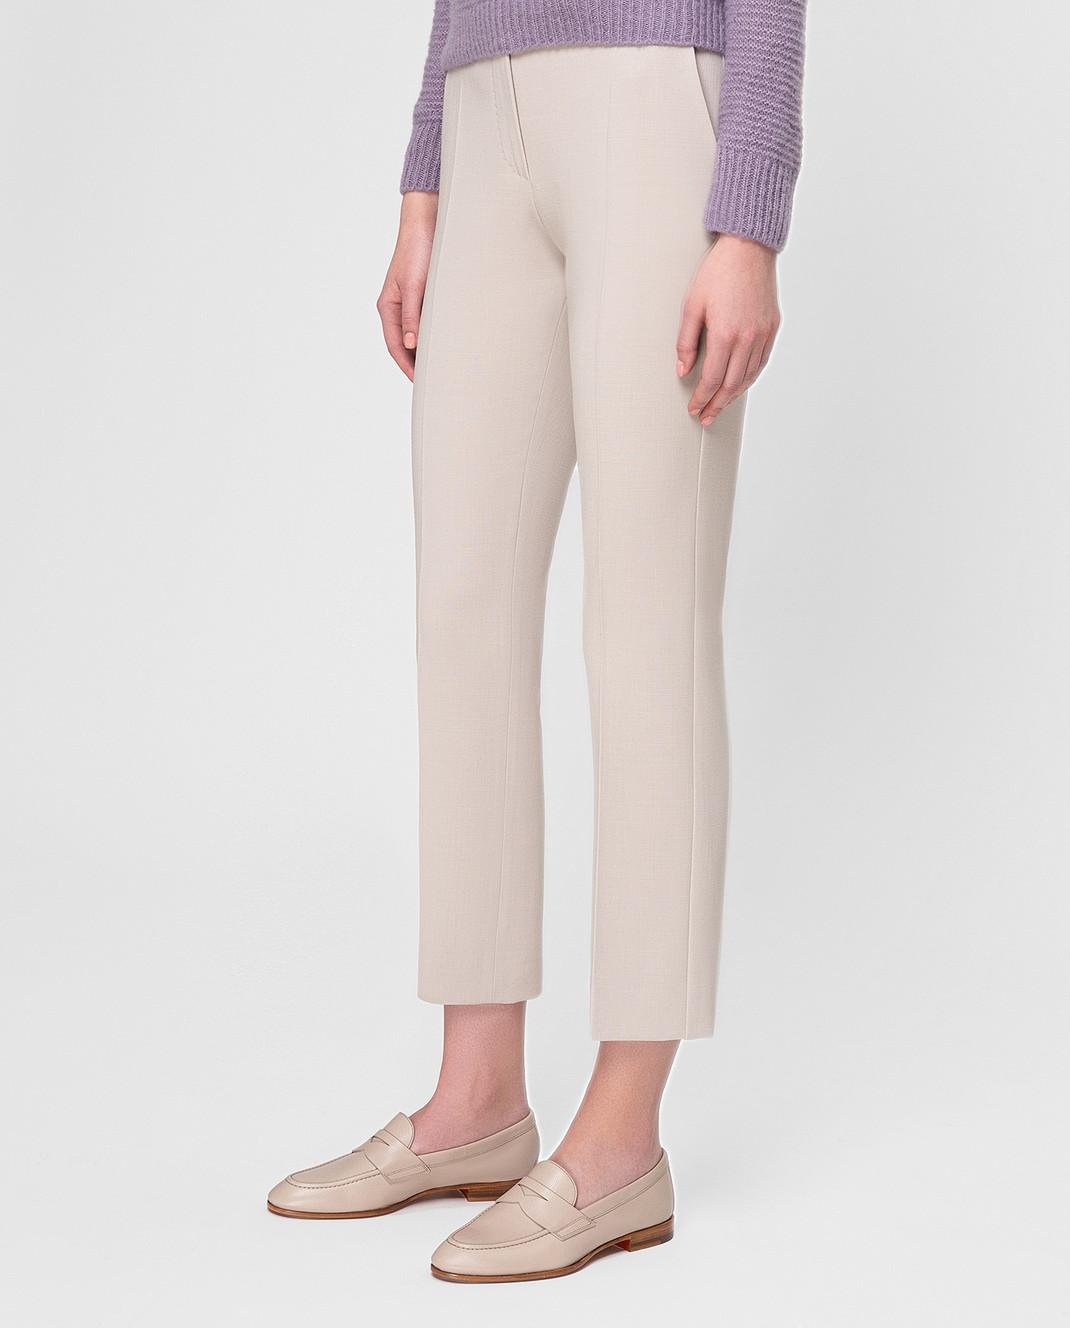 Max Mara Светло-бежевые брюки из шерсти OSTILE изображение 3